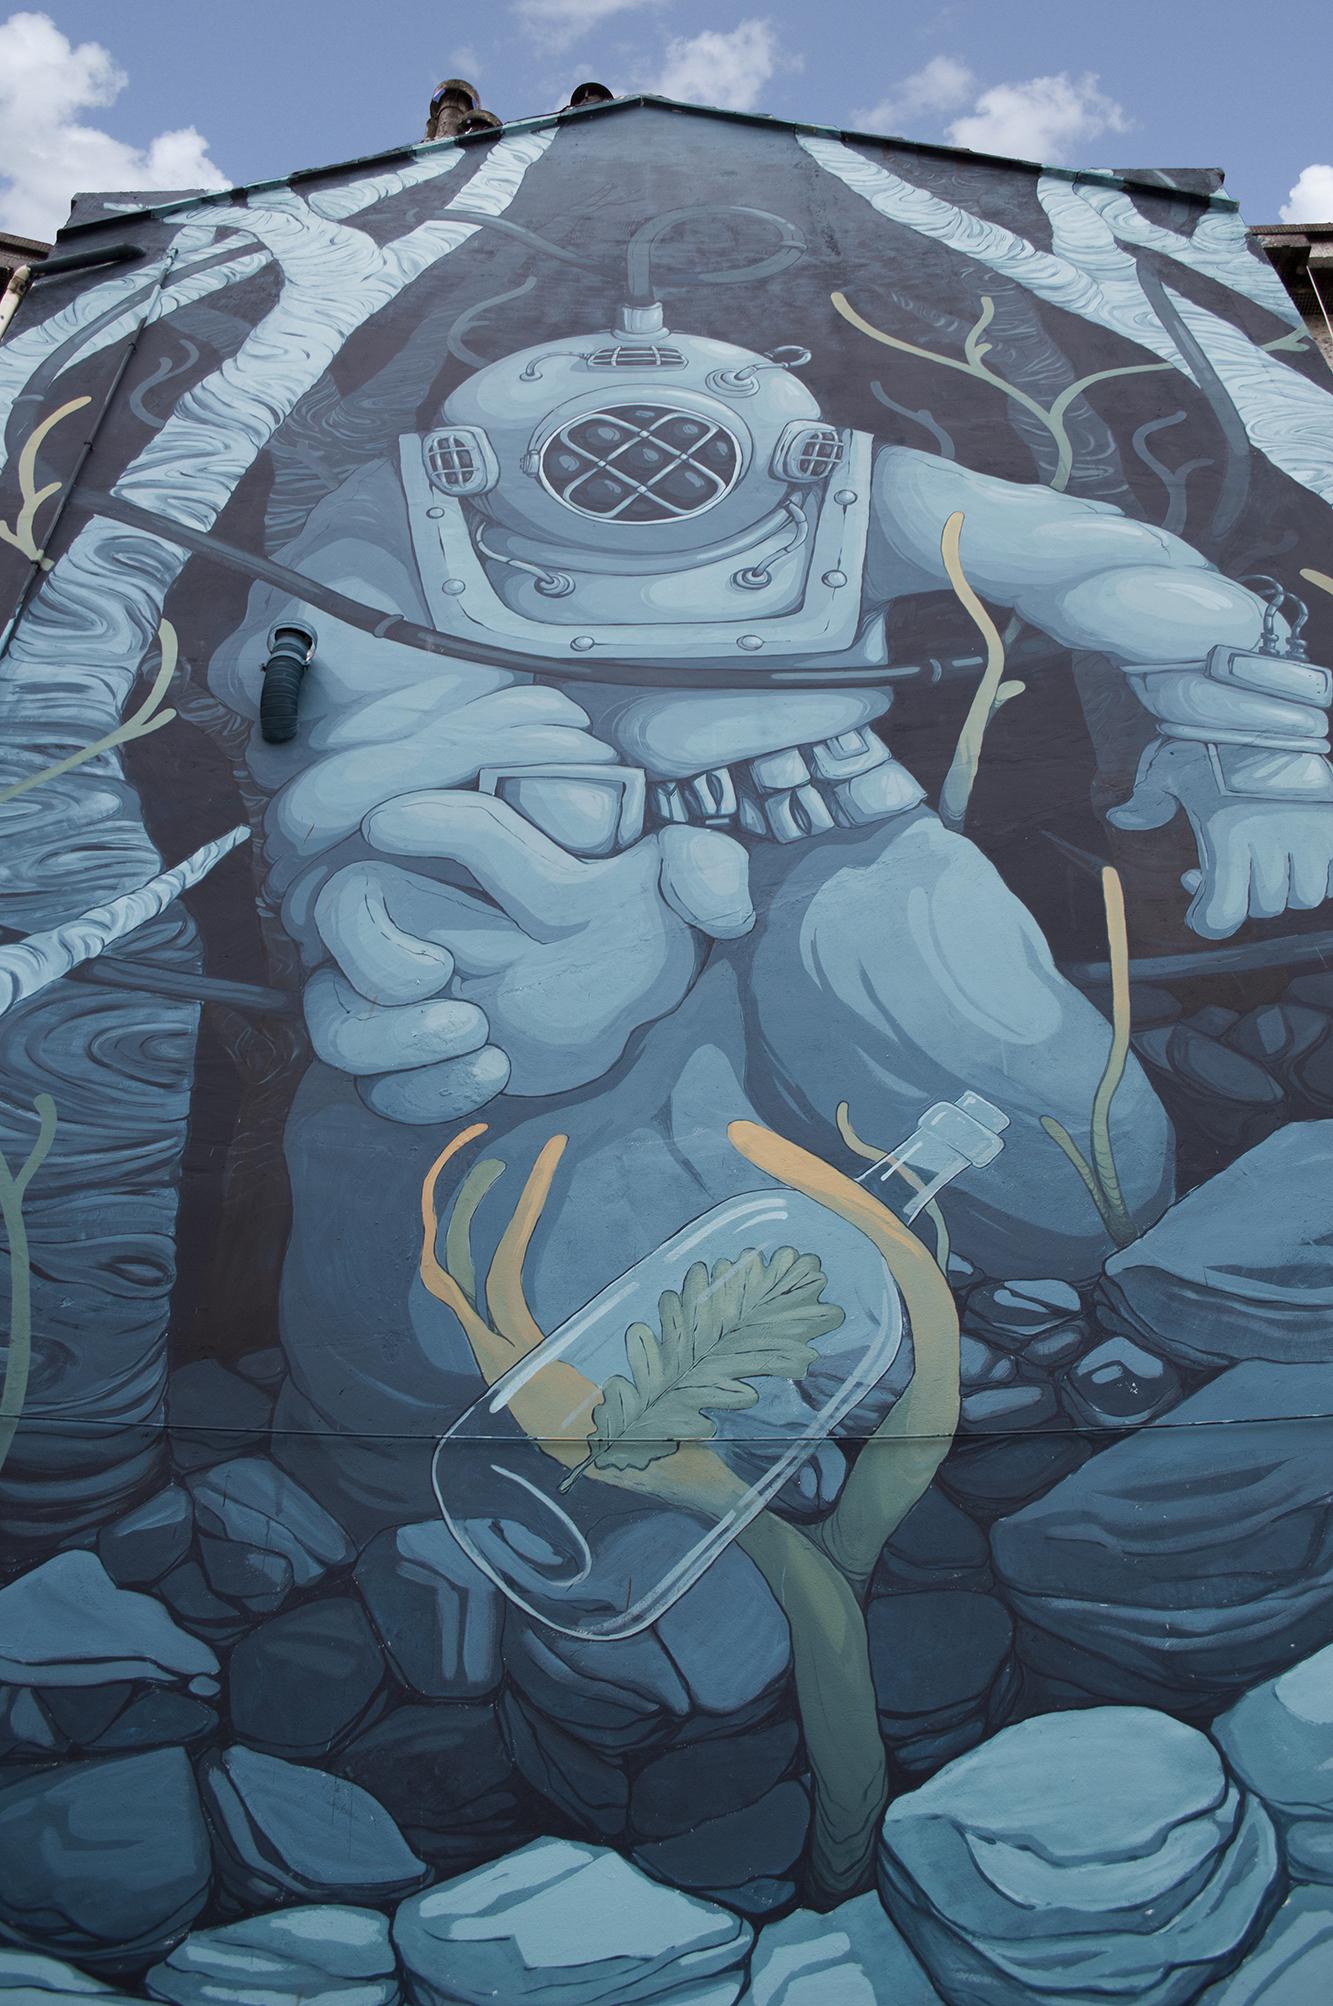 The Origin By MØU for Mutante Creativo in Spain Artes & contextos MØU 6